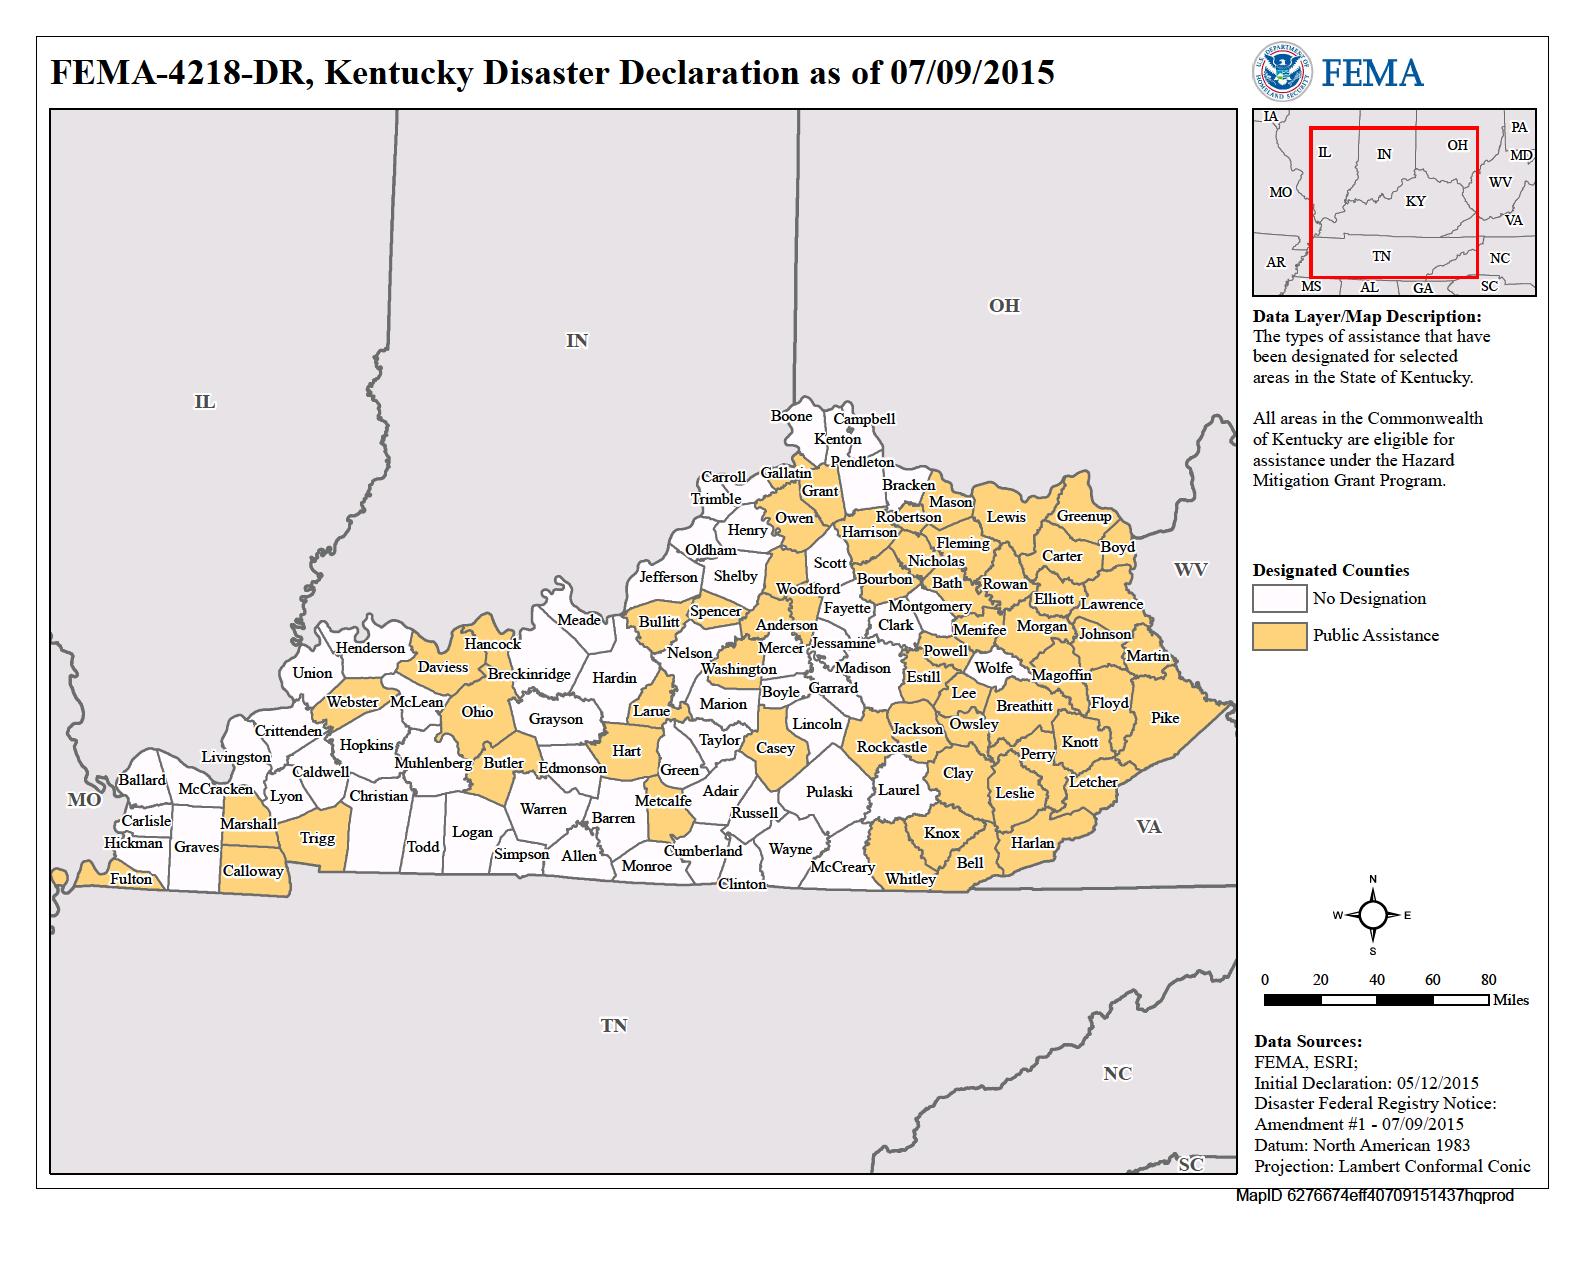 Kentucky Severe Winter Storm Snowstorm Flooding Landslides and